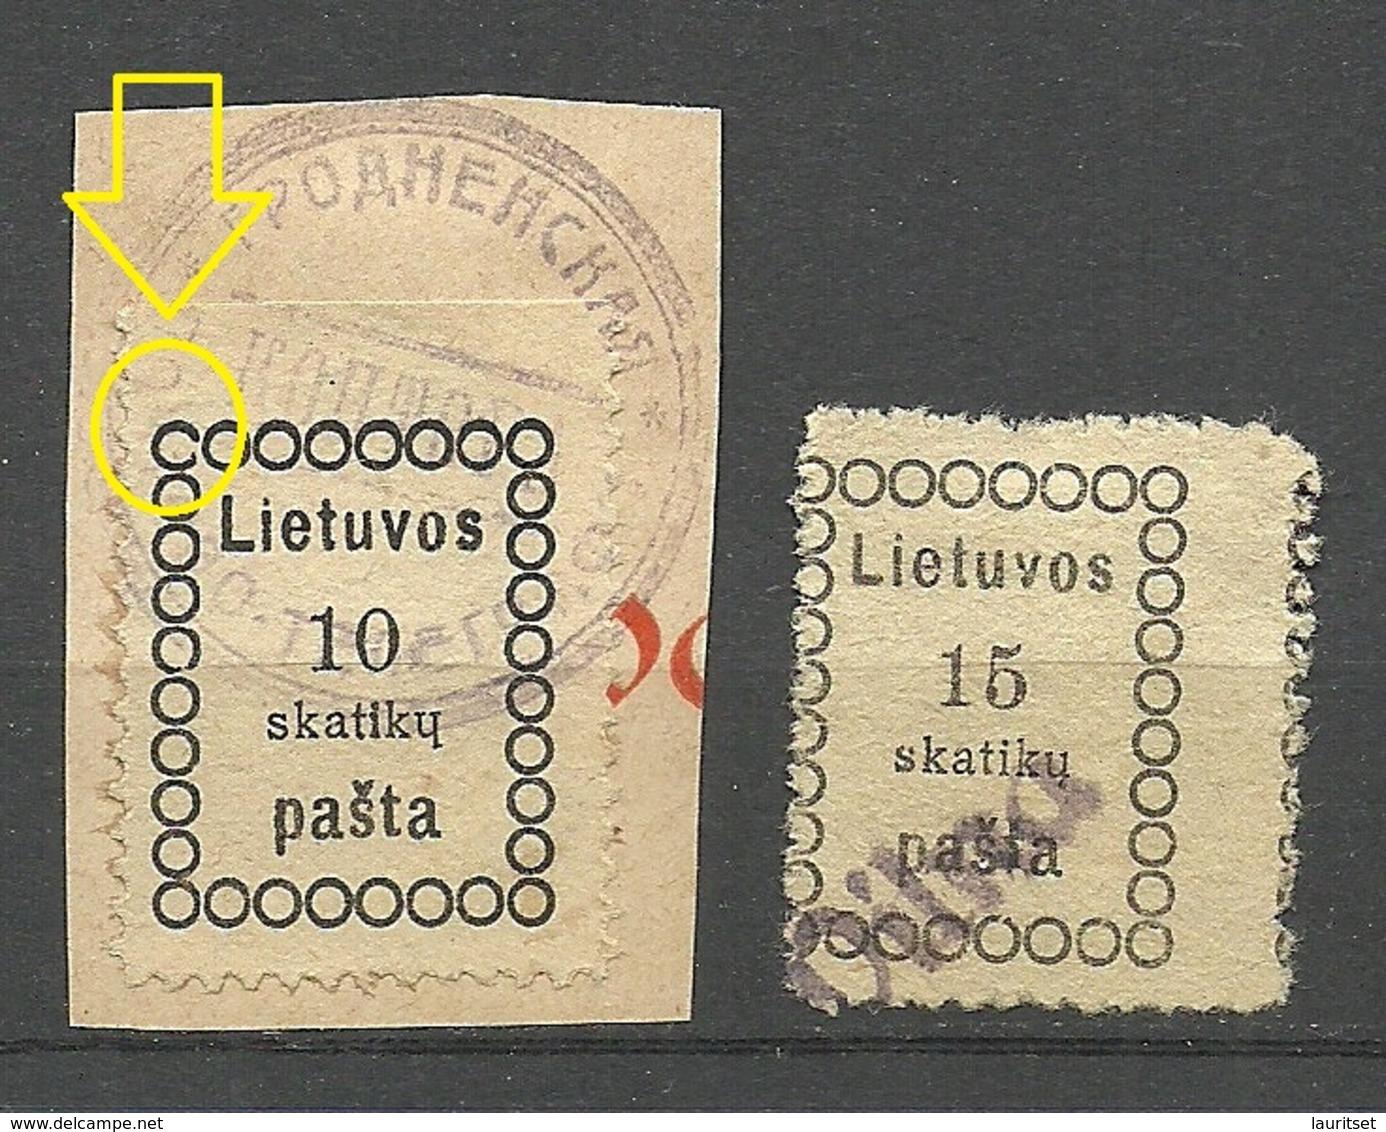 LITAUEN Lithuania 1918 Michel 1 - 2 Incl VILNA Line Cancel + ERROR Abart Variety - Litauen